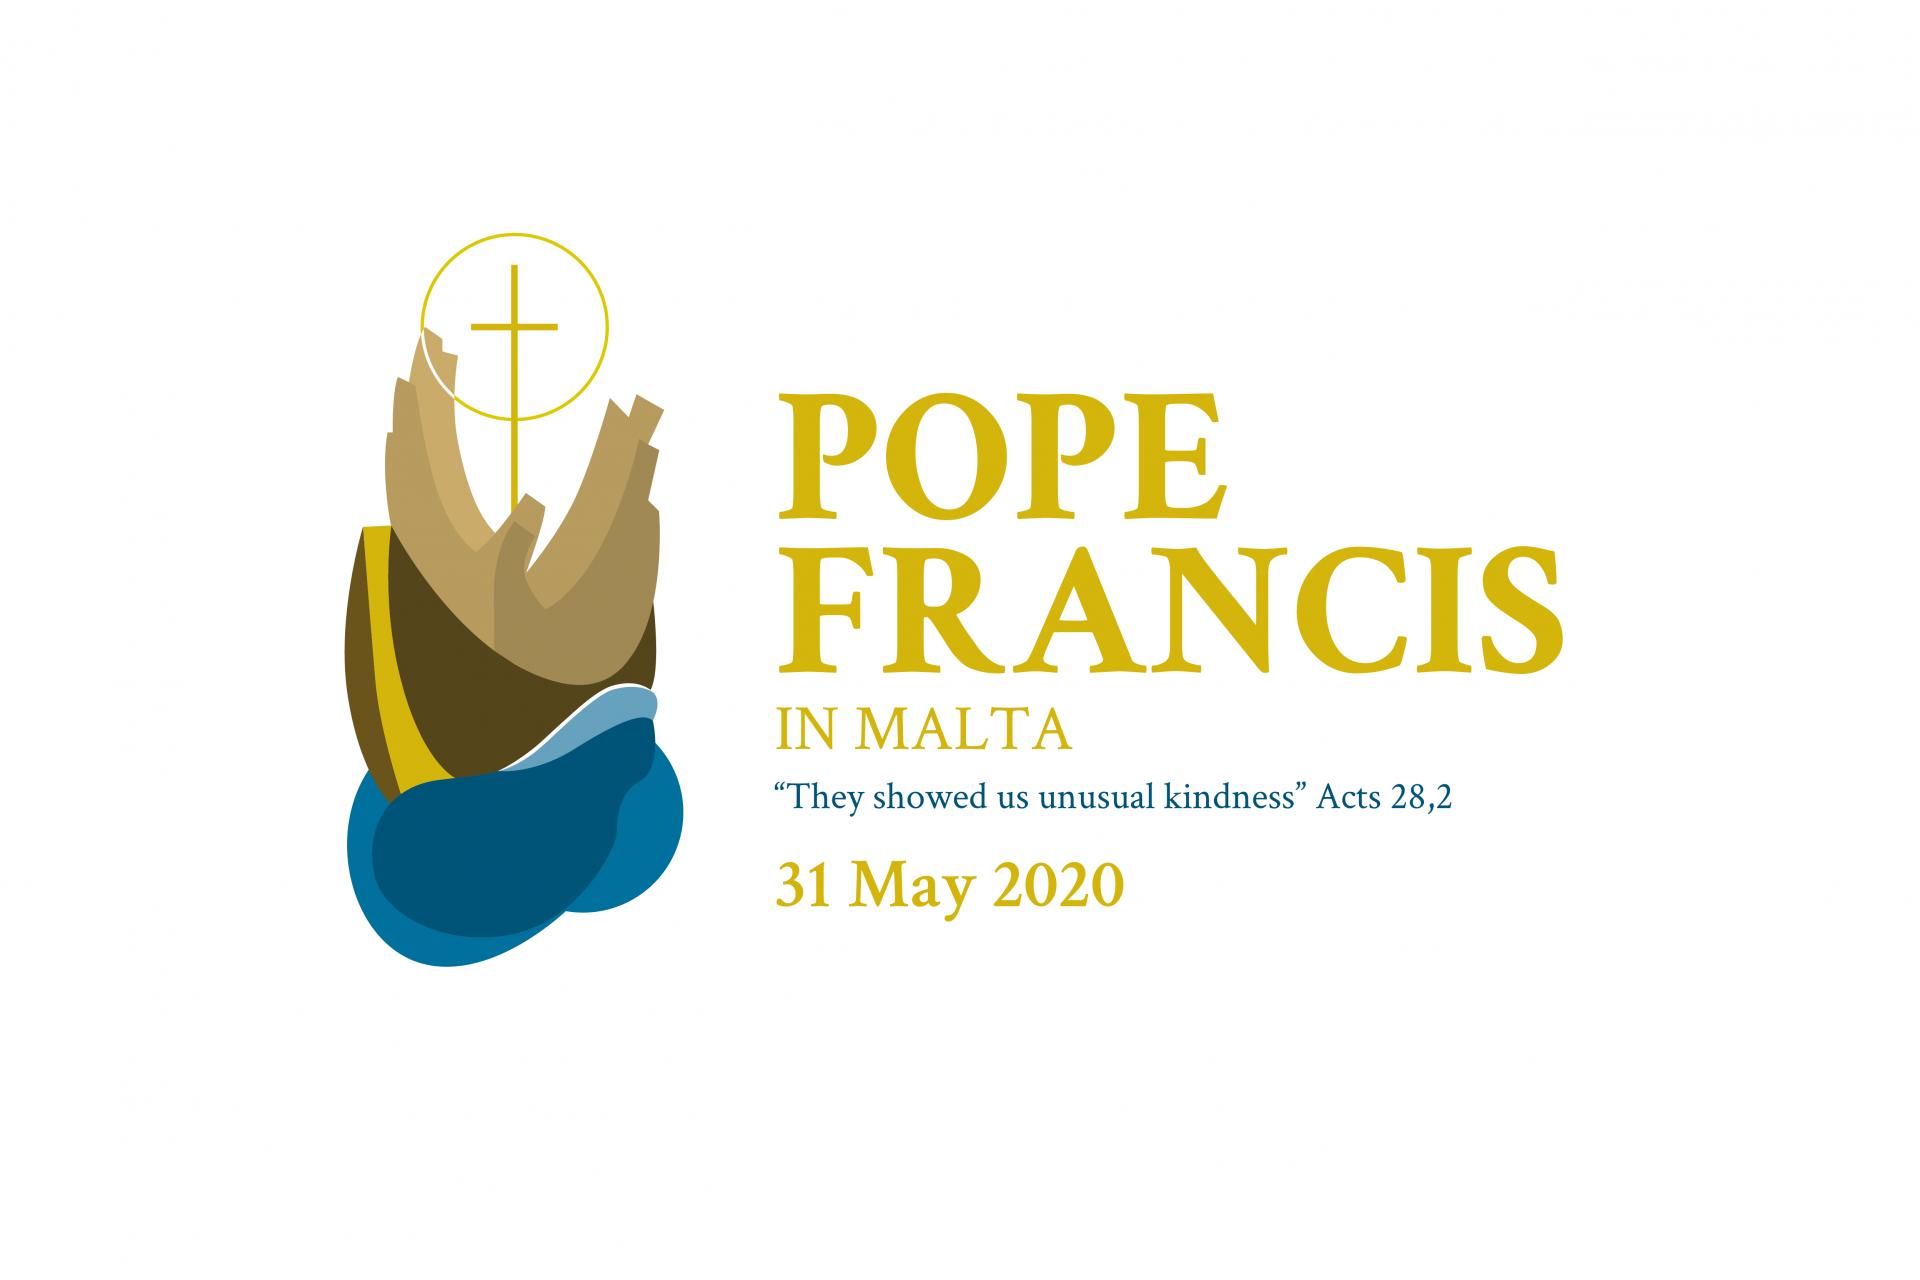 The logo for May's papal visit